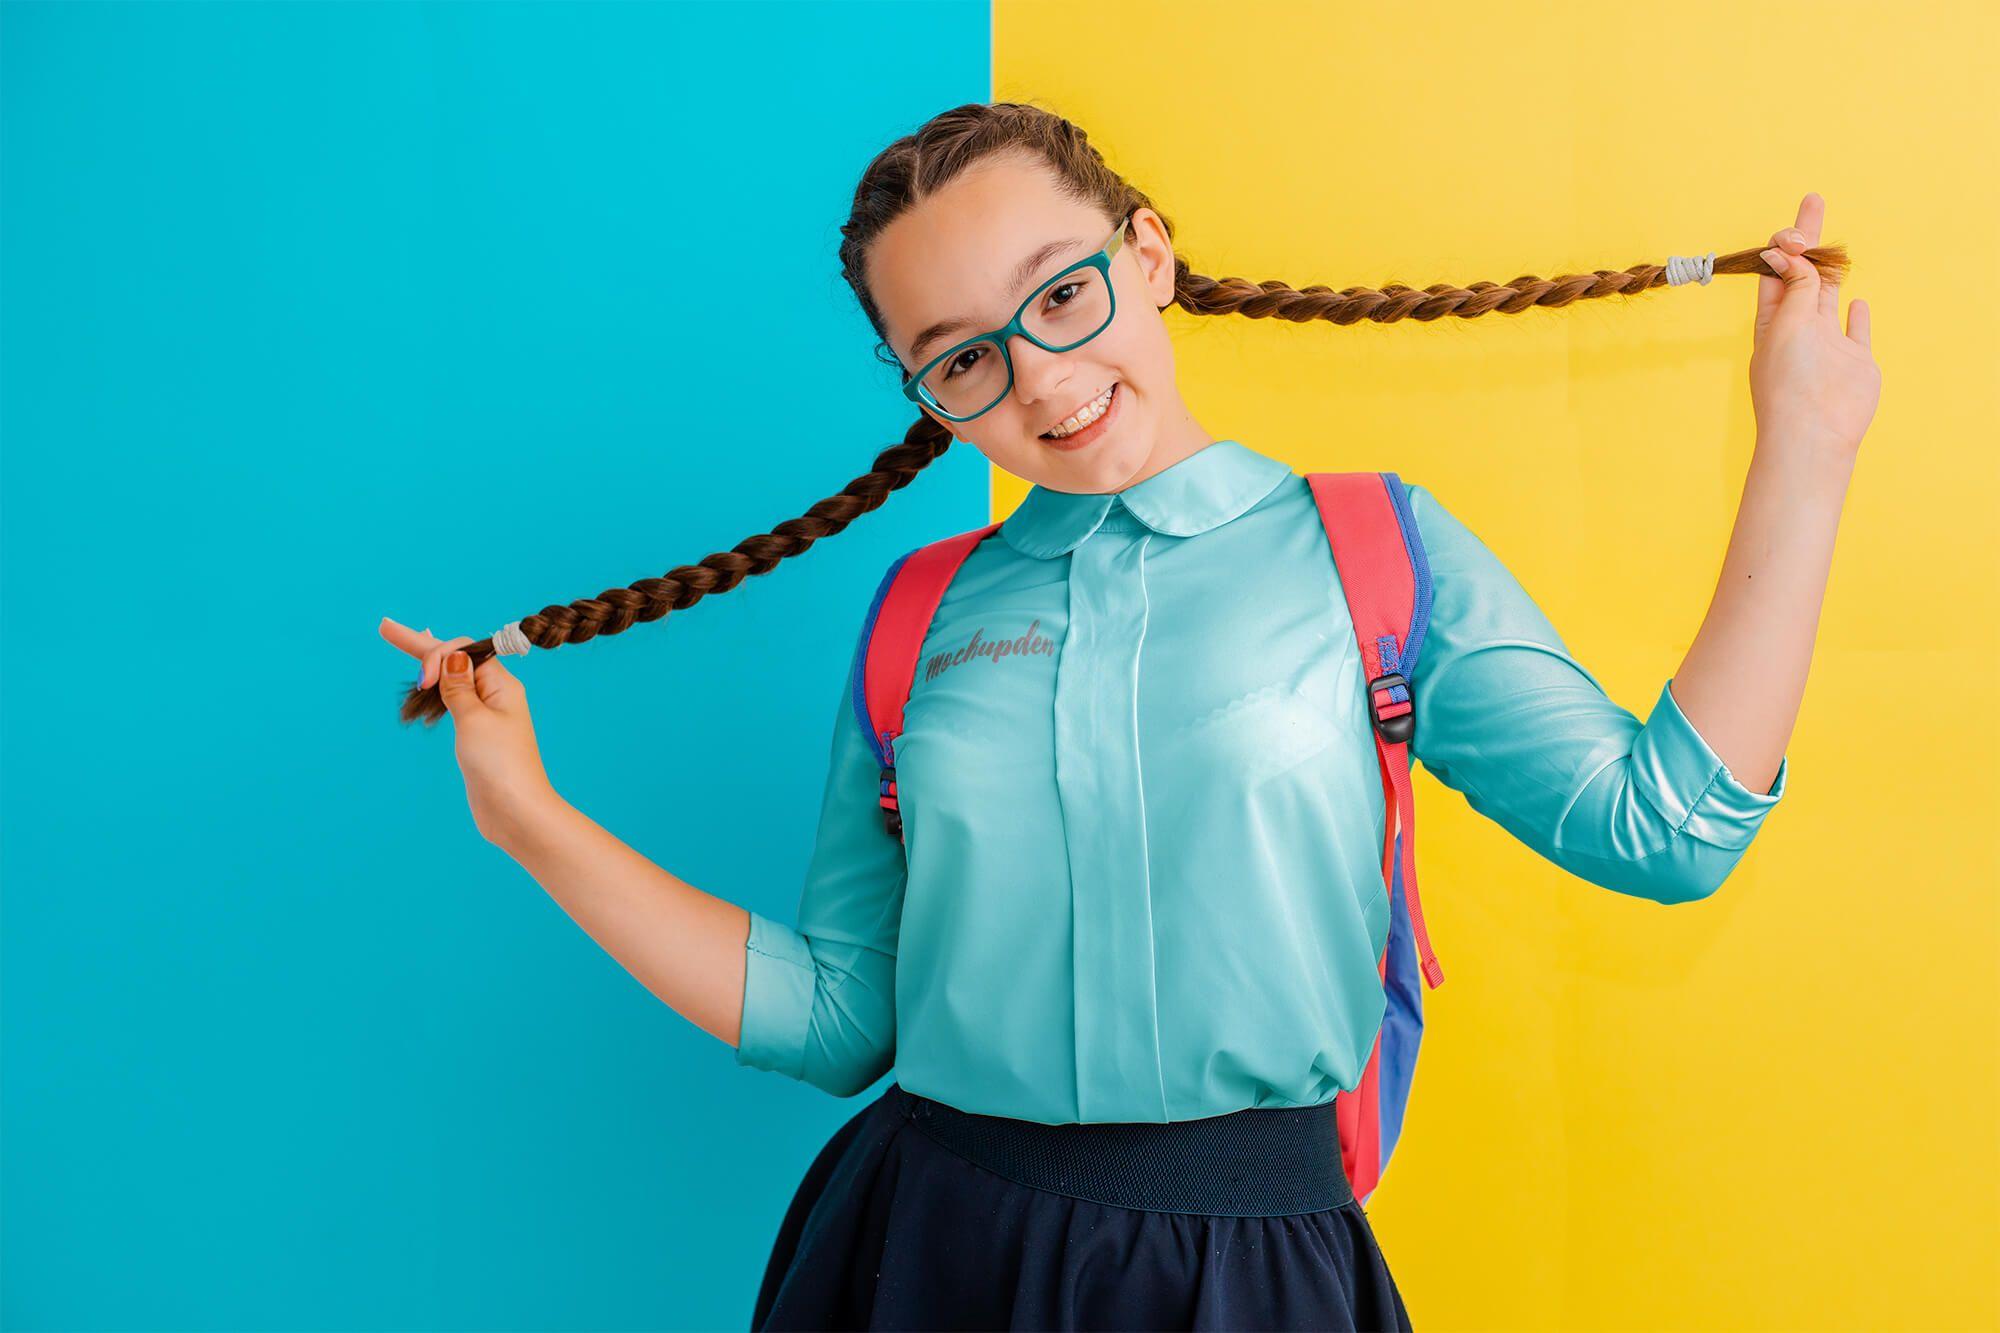 Free School Uniform Mockup Psd Template Clothing Mockup School Uniform Fashion Psd Designs